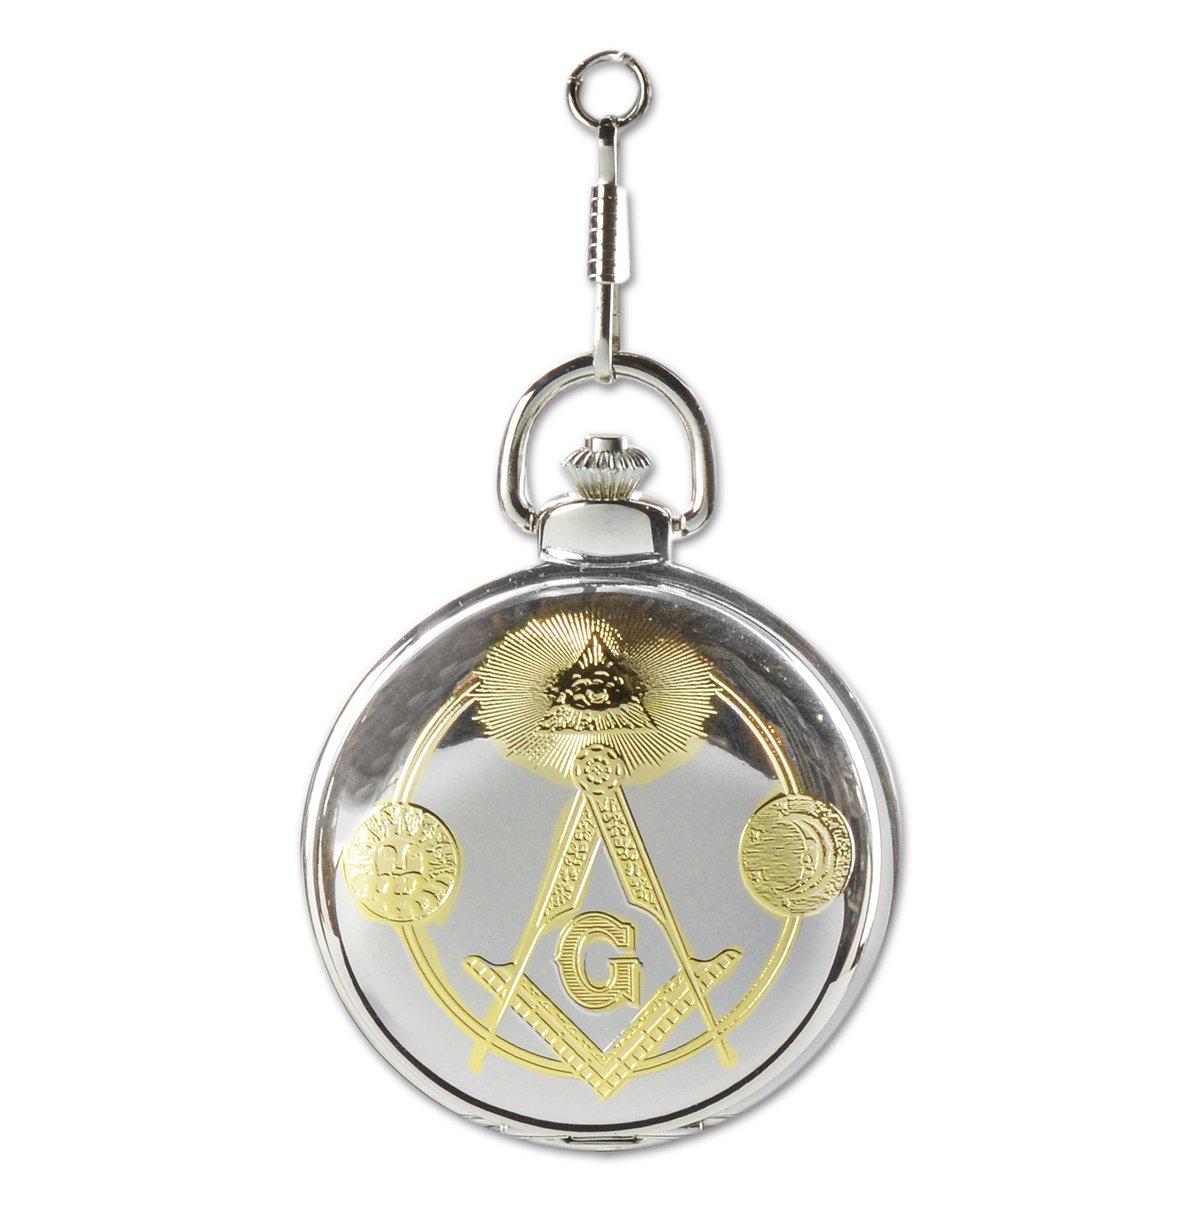 The Masonic Exchange Masonic Square & Compass Silver & Gold Pocket Watch - 2'' Diameter